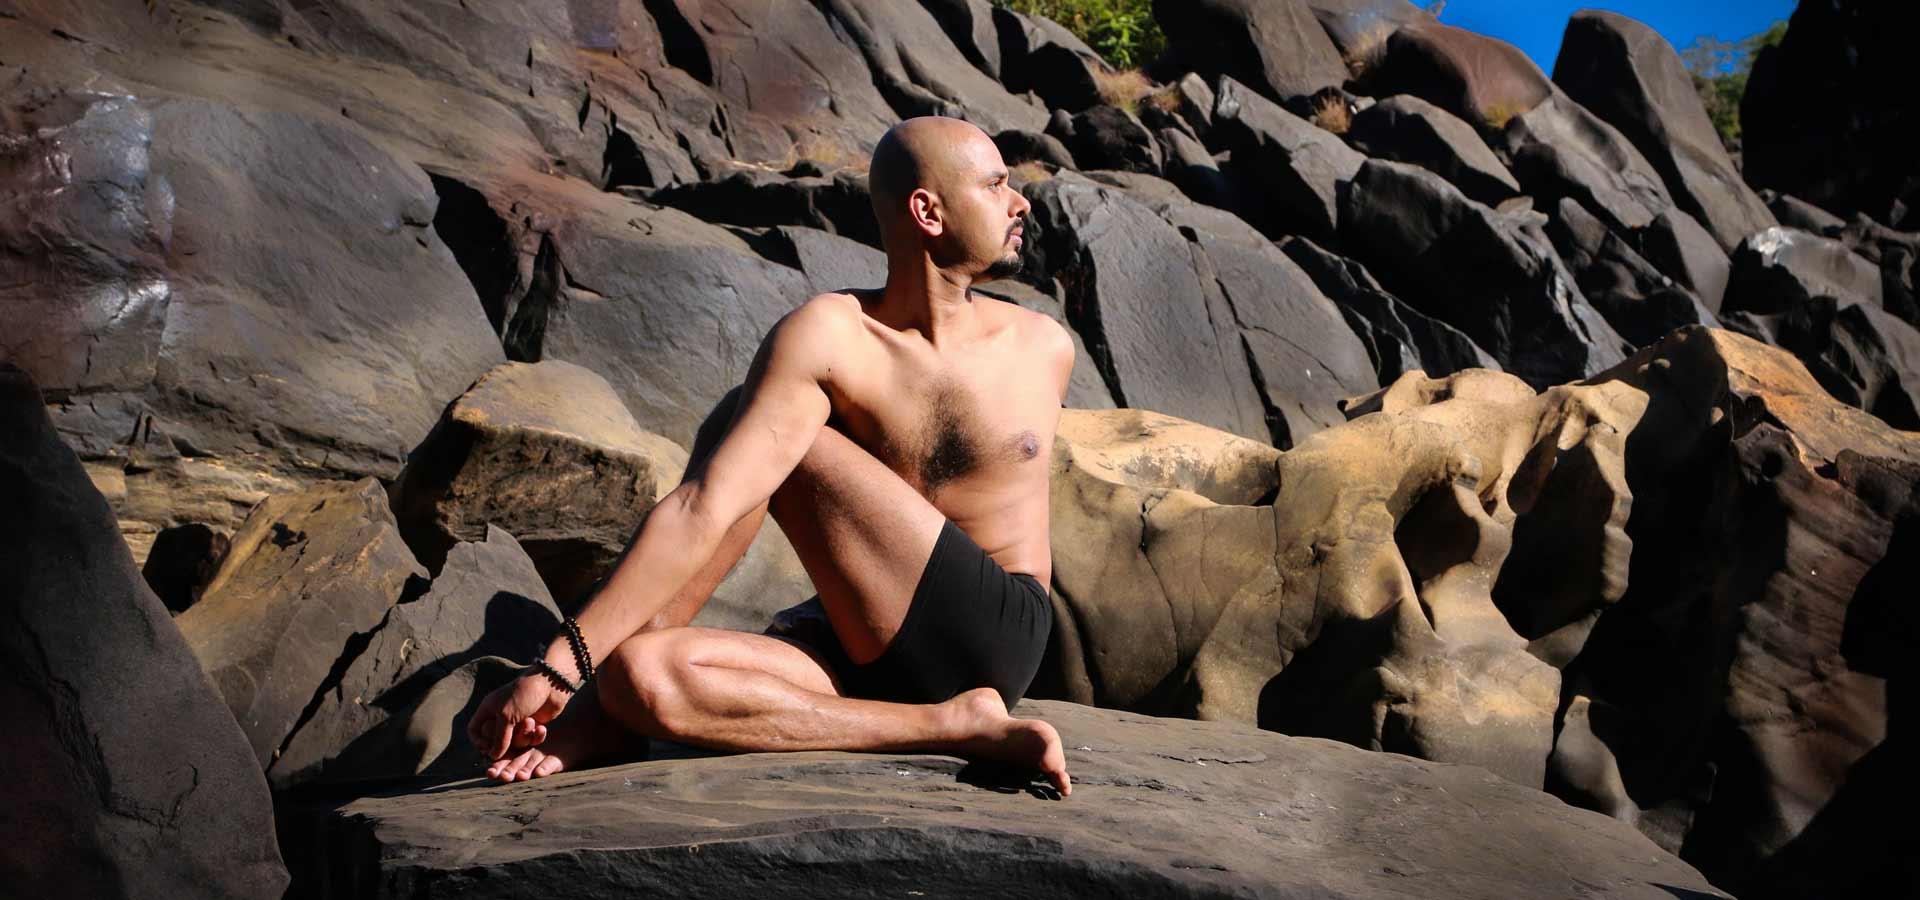 Oil_Yoga-Trupteesh-Hurikadale_00004